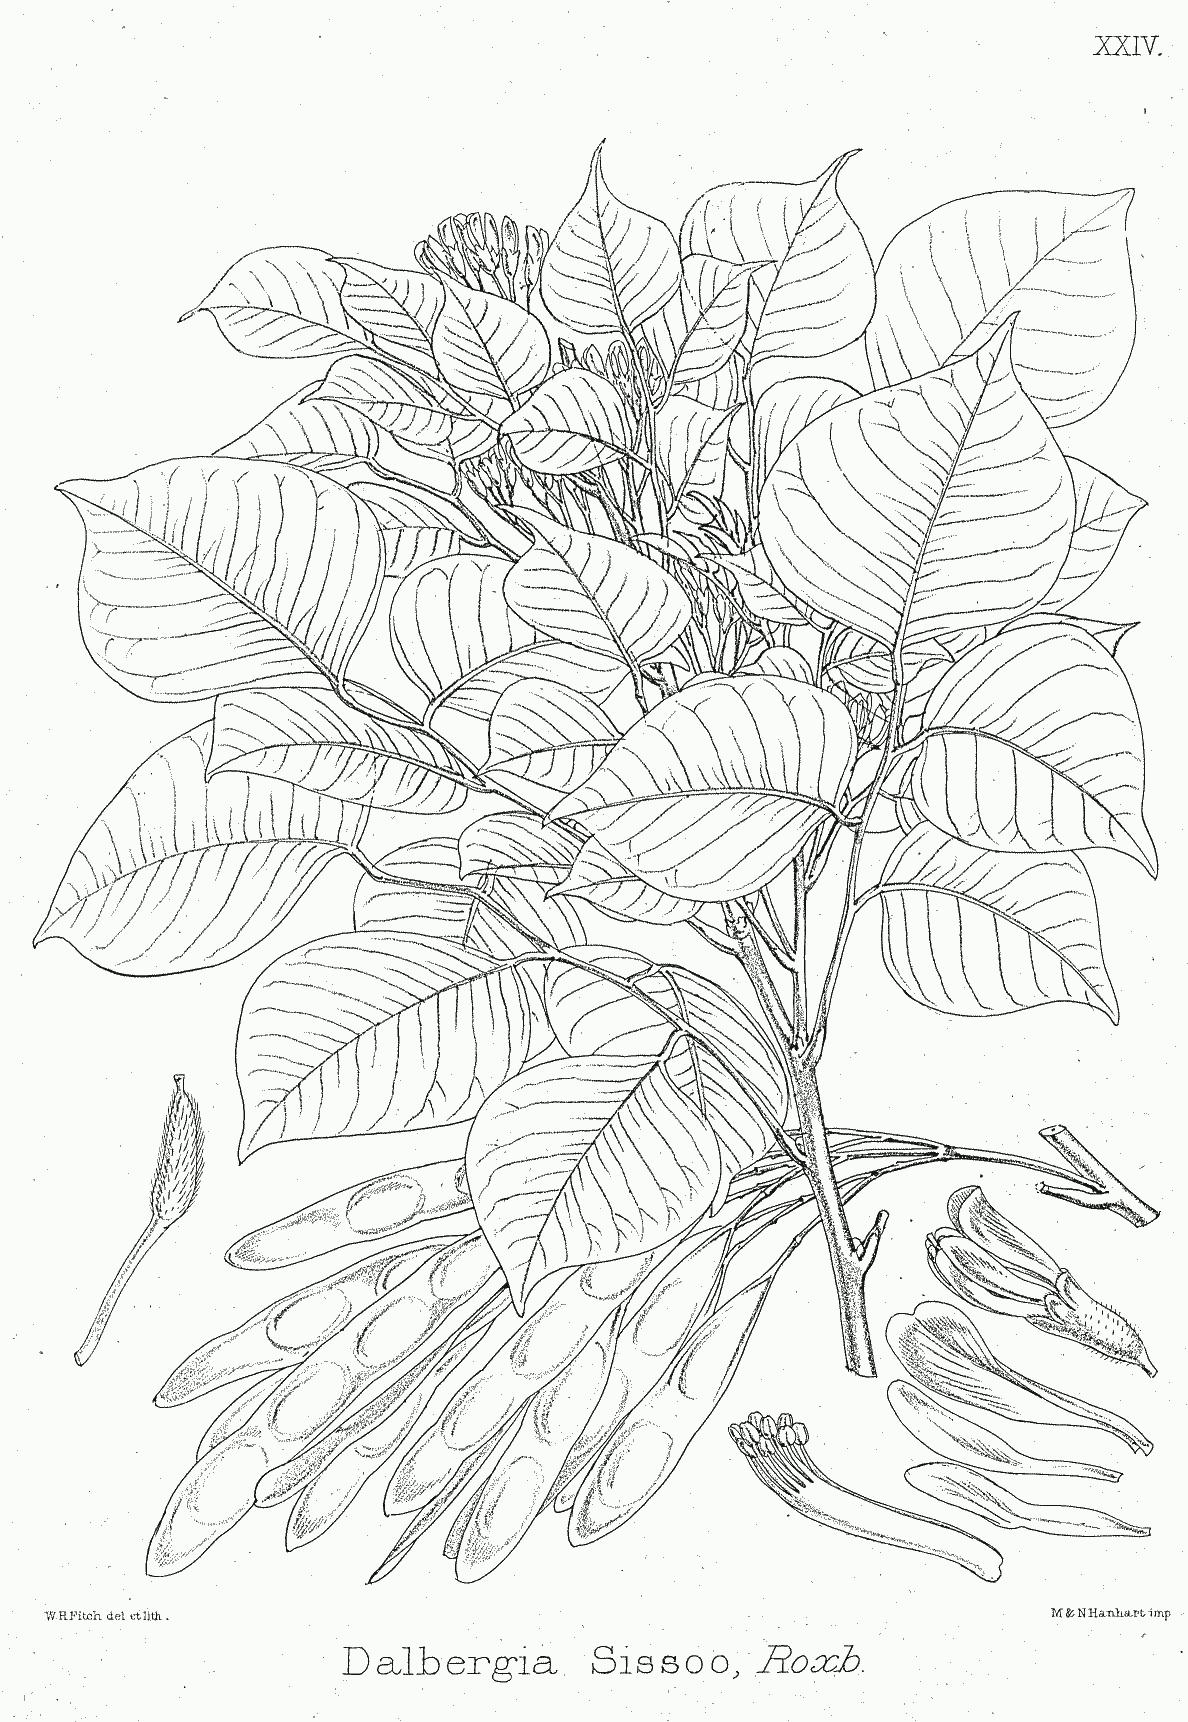 Dalbergia